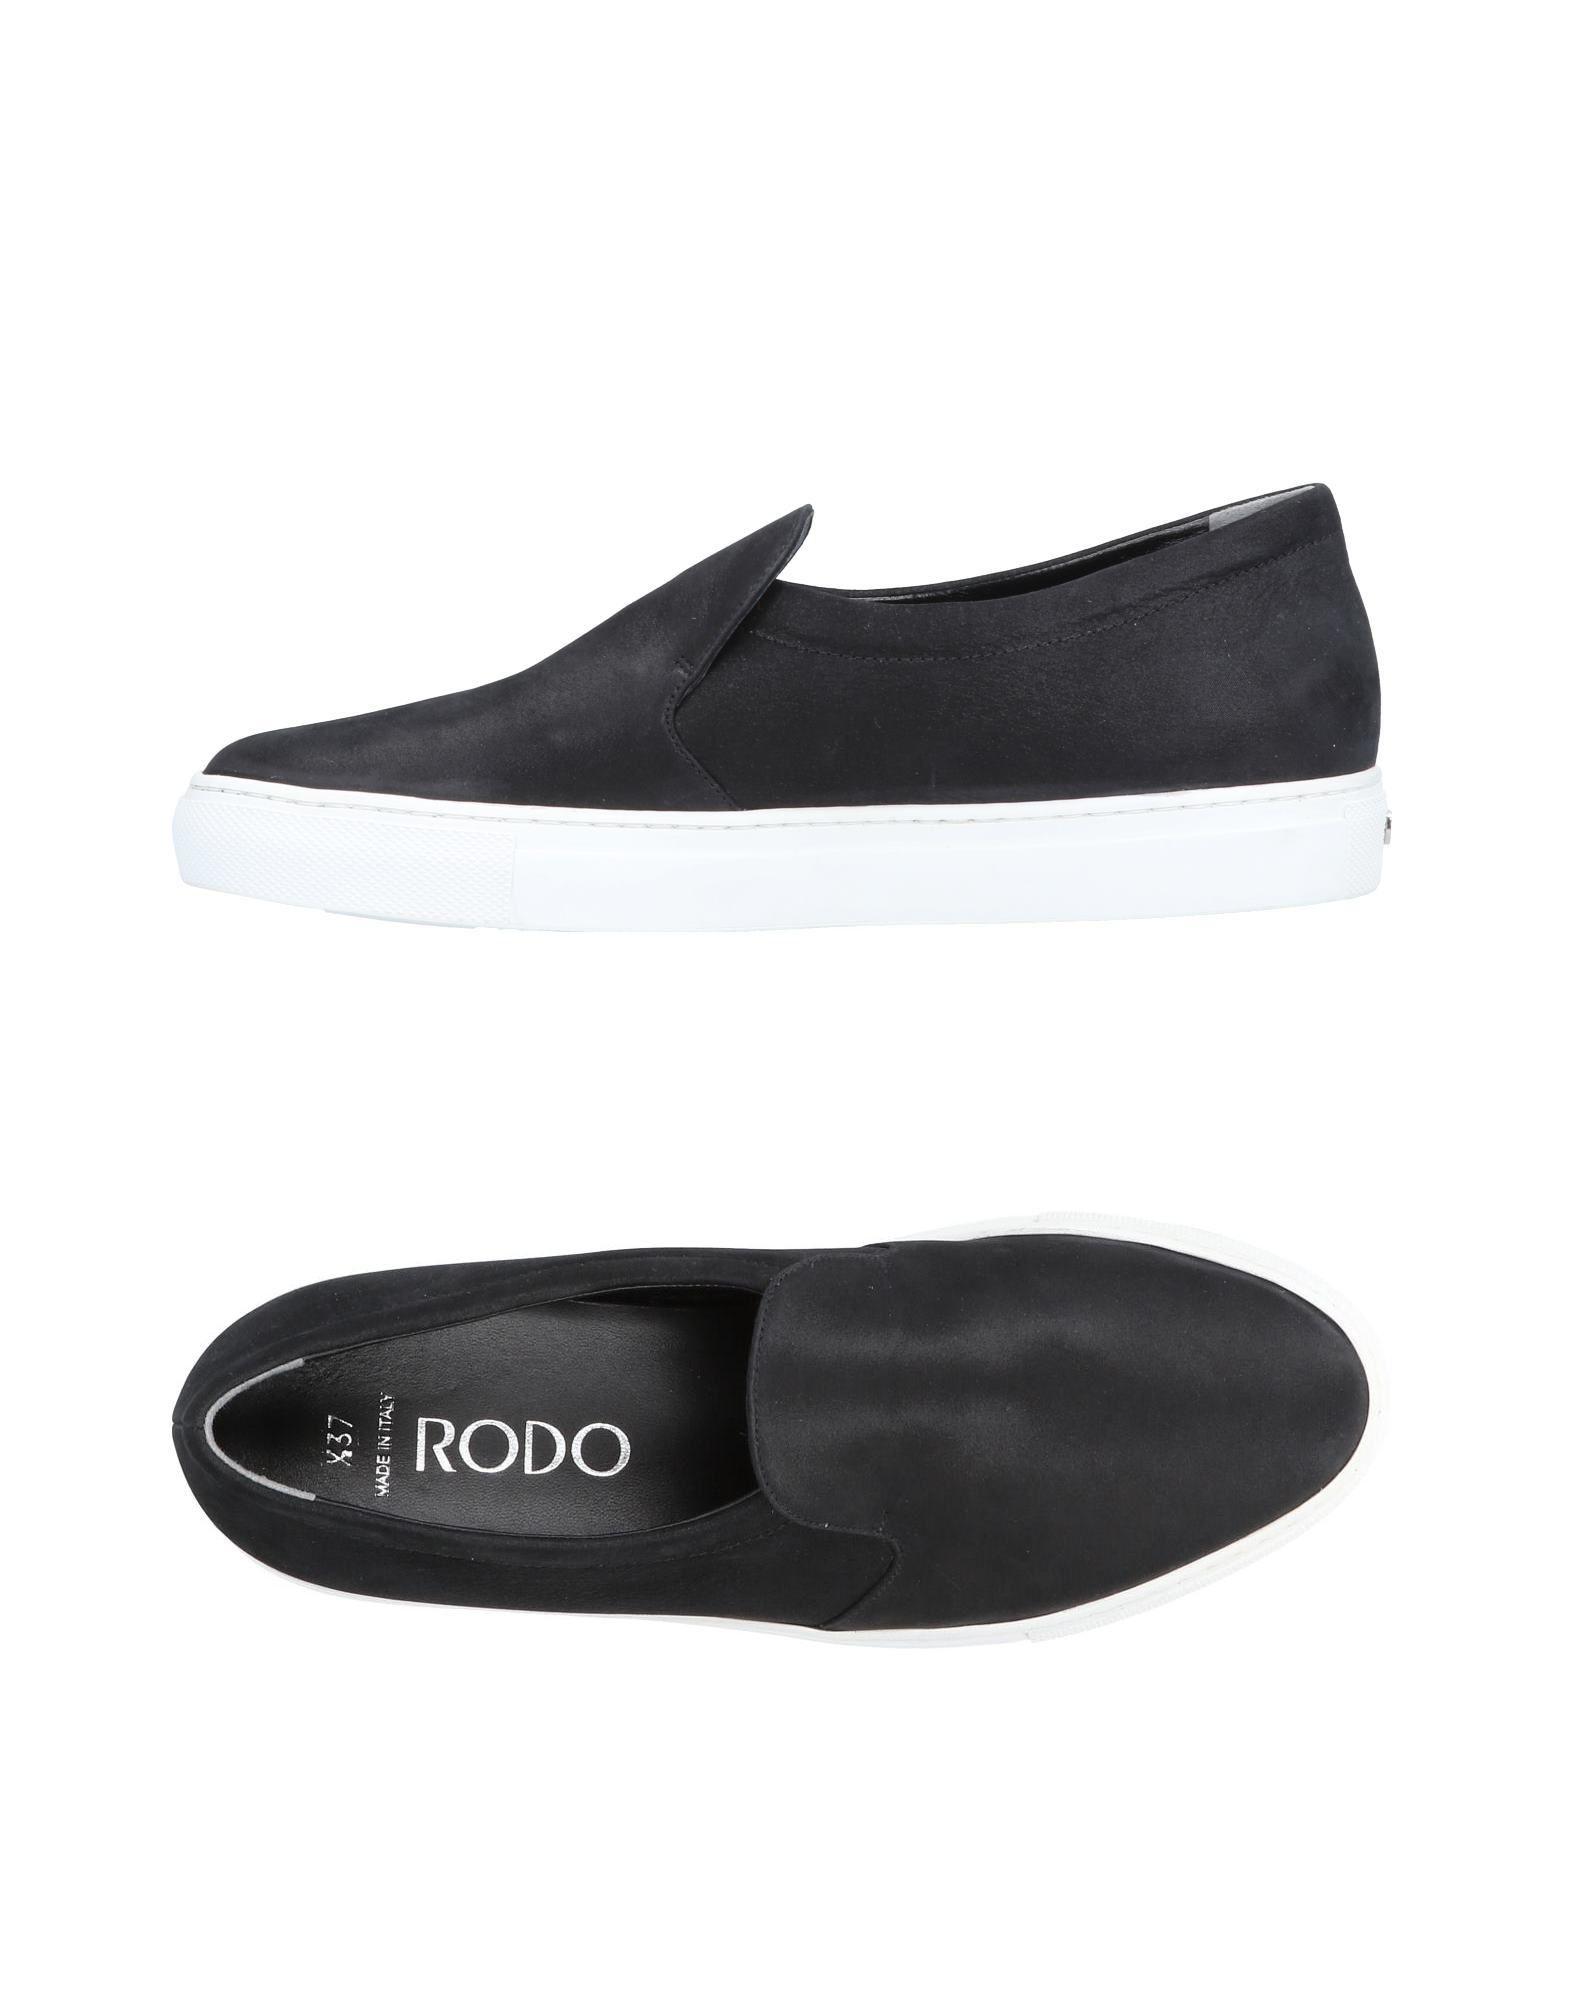 Stilvolle billige Schuhe Damen Rodo Sneakers Damen Schuhe  11498971JN f6724a